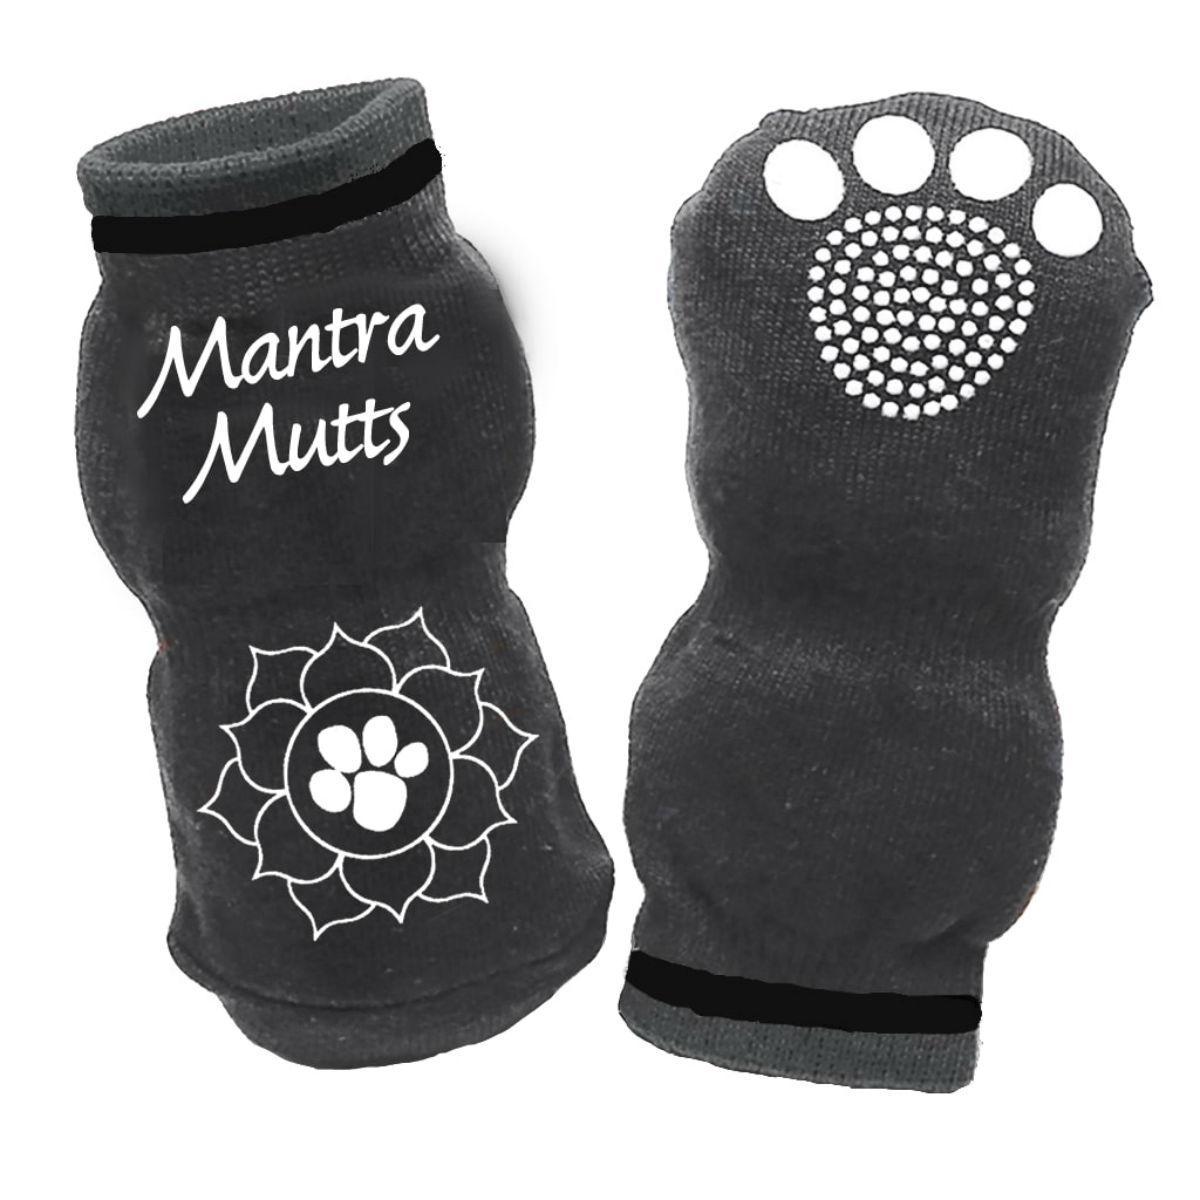 Mantra Muttsoks Dog Socks by Muttluks - Gray Lotus Paw